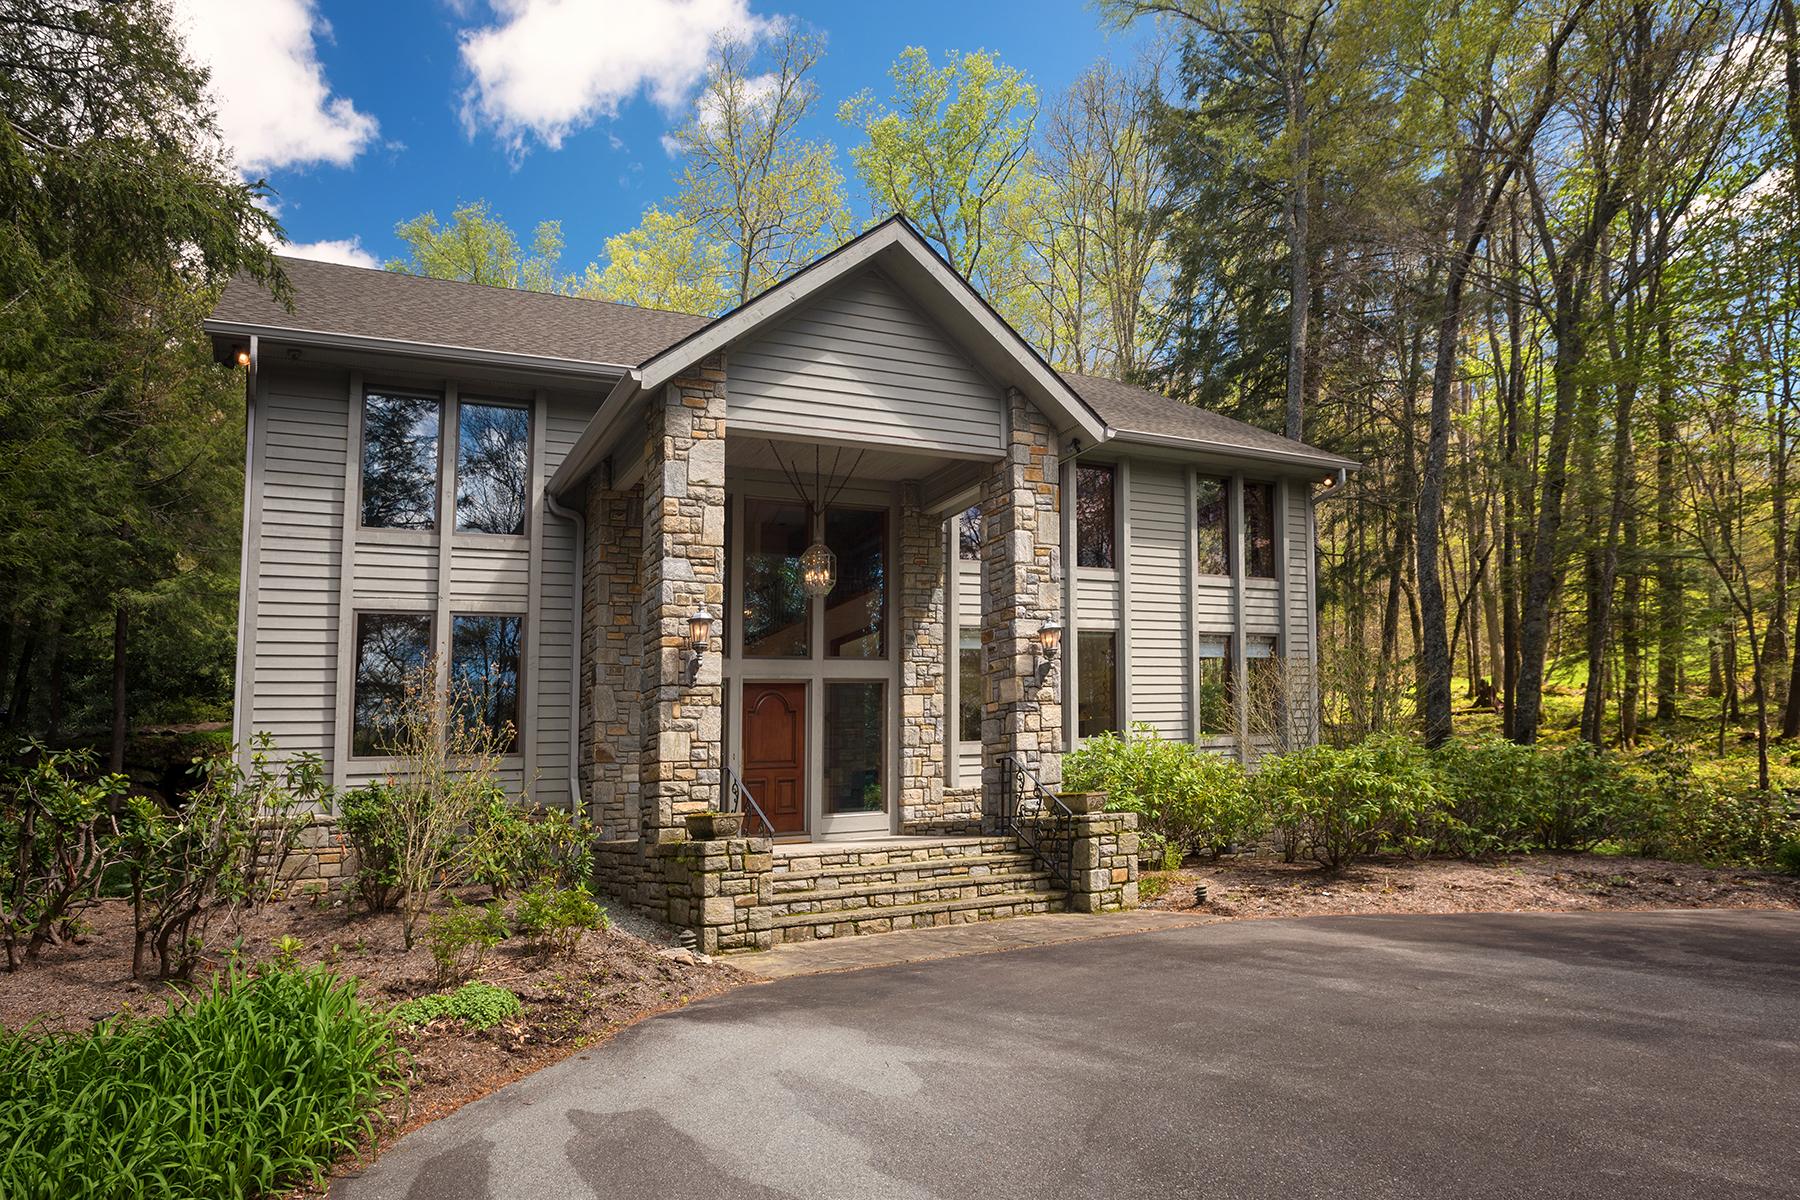 獨棟家庭住宅 為 出售 在 LINVILLE - GRANDFATHER GOLF AND COUNTRY CLUB 550 Bridle Trail Rd Linville, 北卡羅來納州, 28646 美國